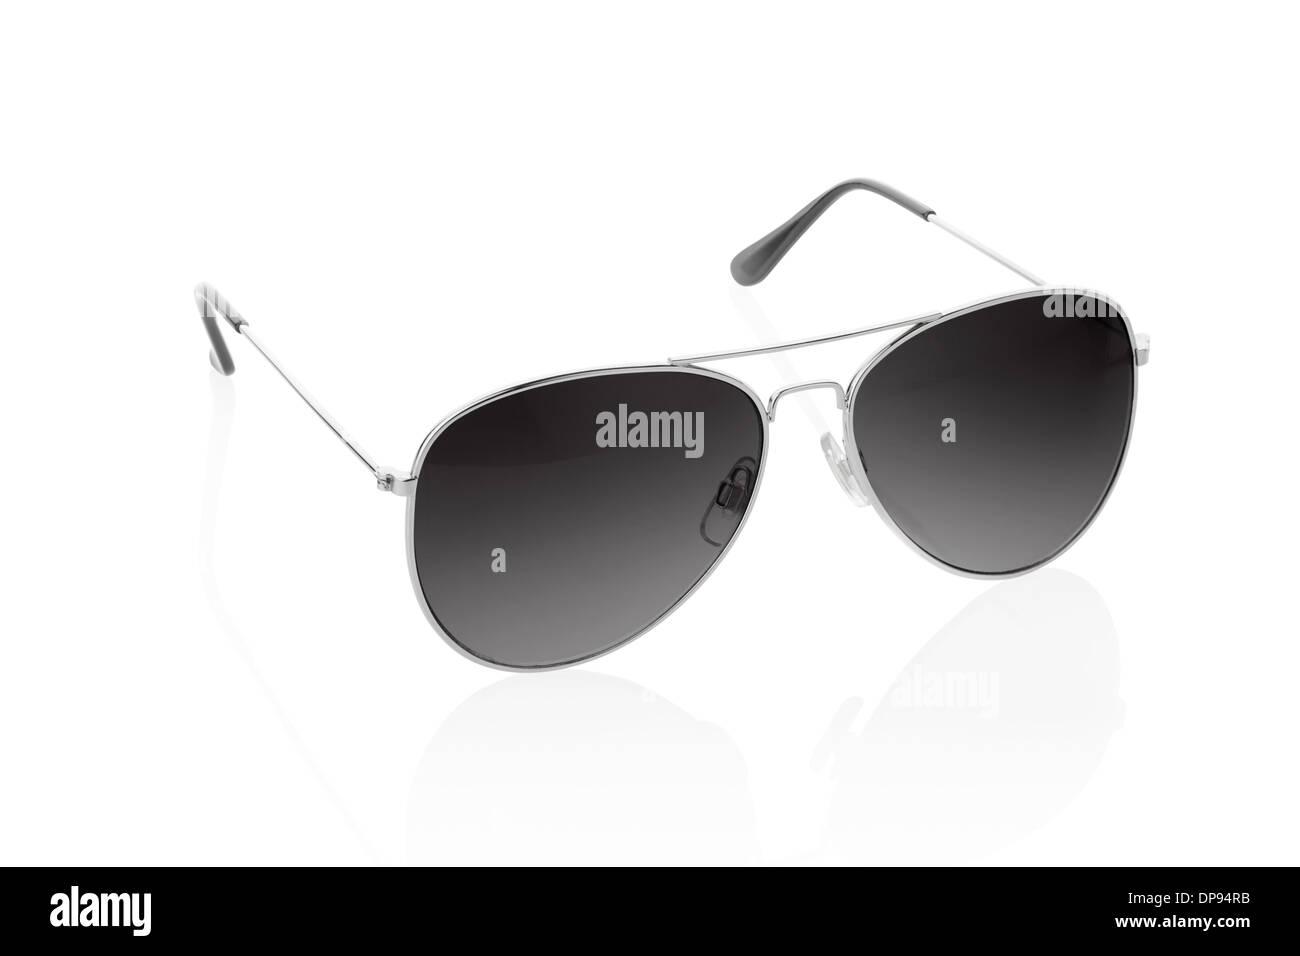 Sunglasses - Stock Image